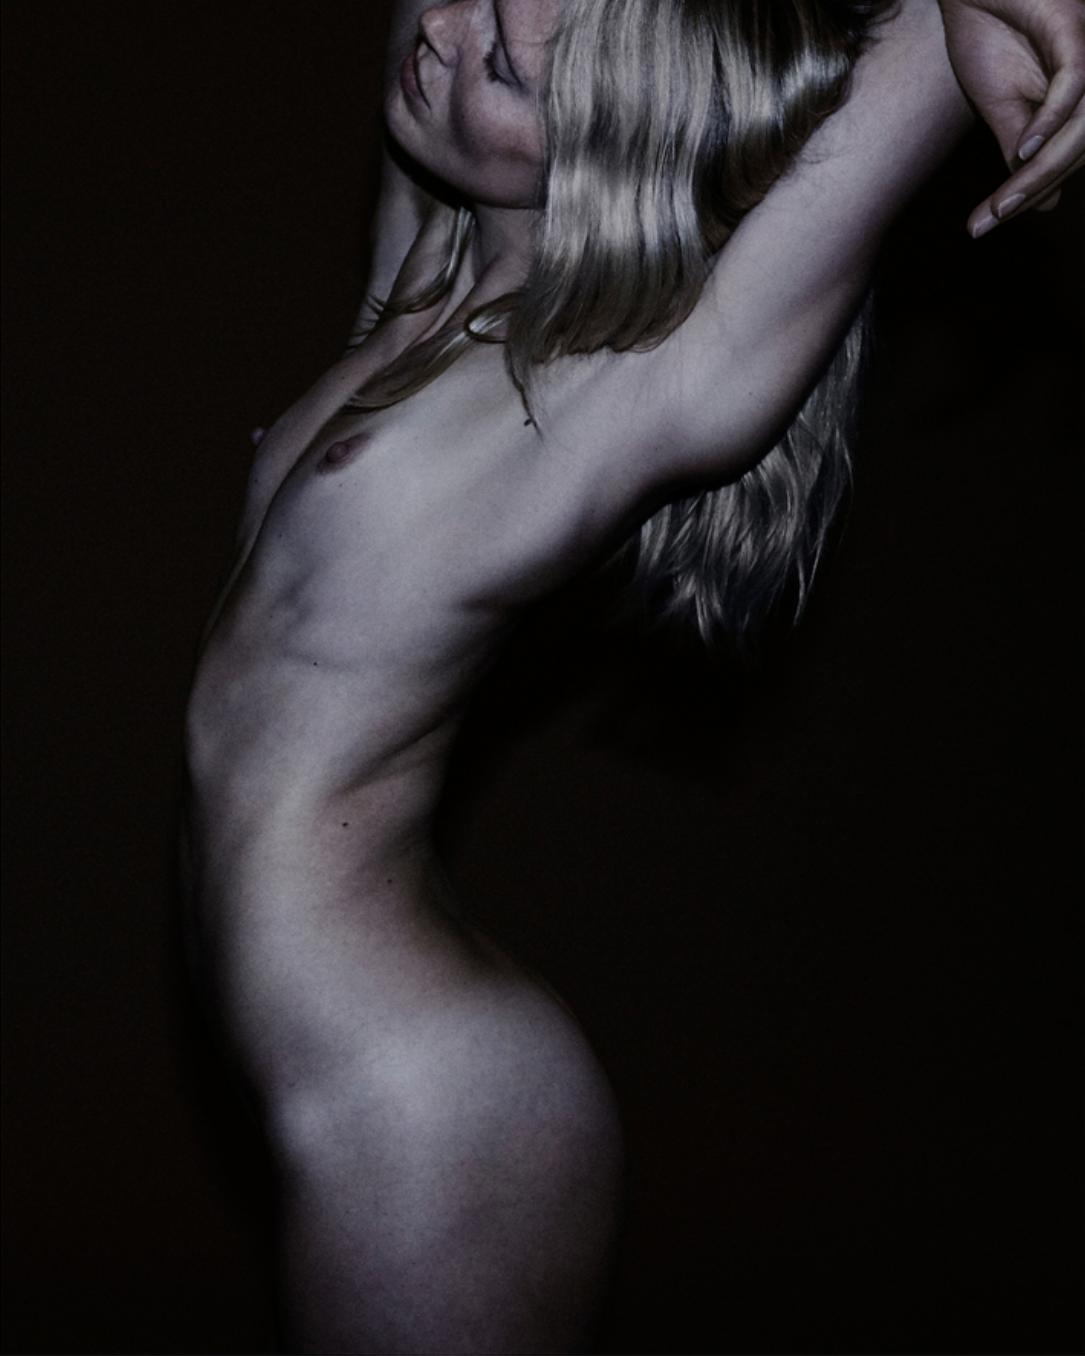 Daniel_Jackson-01-thephotoregistry.png